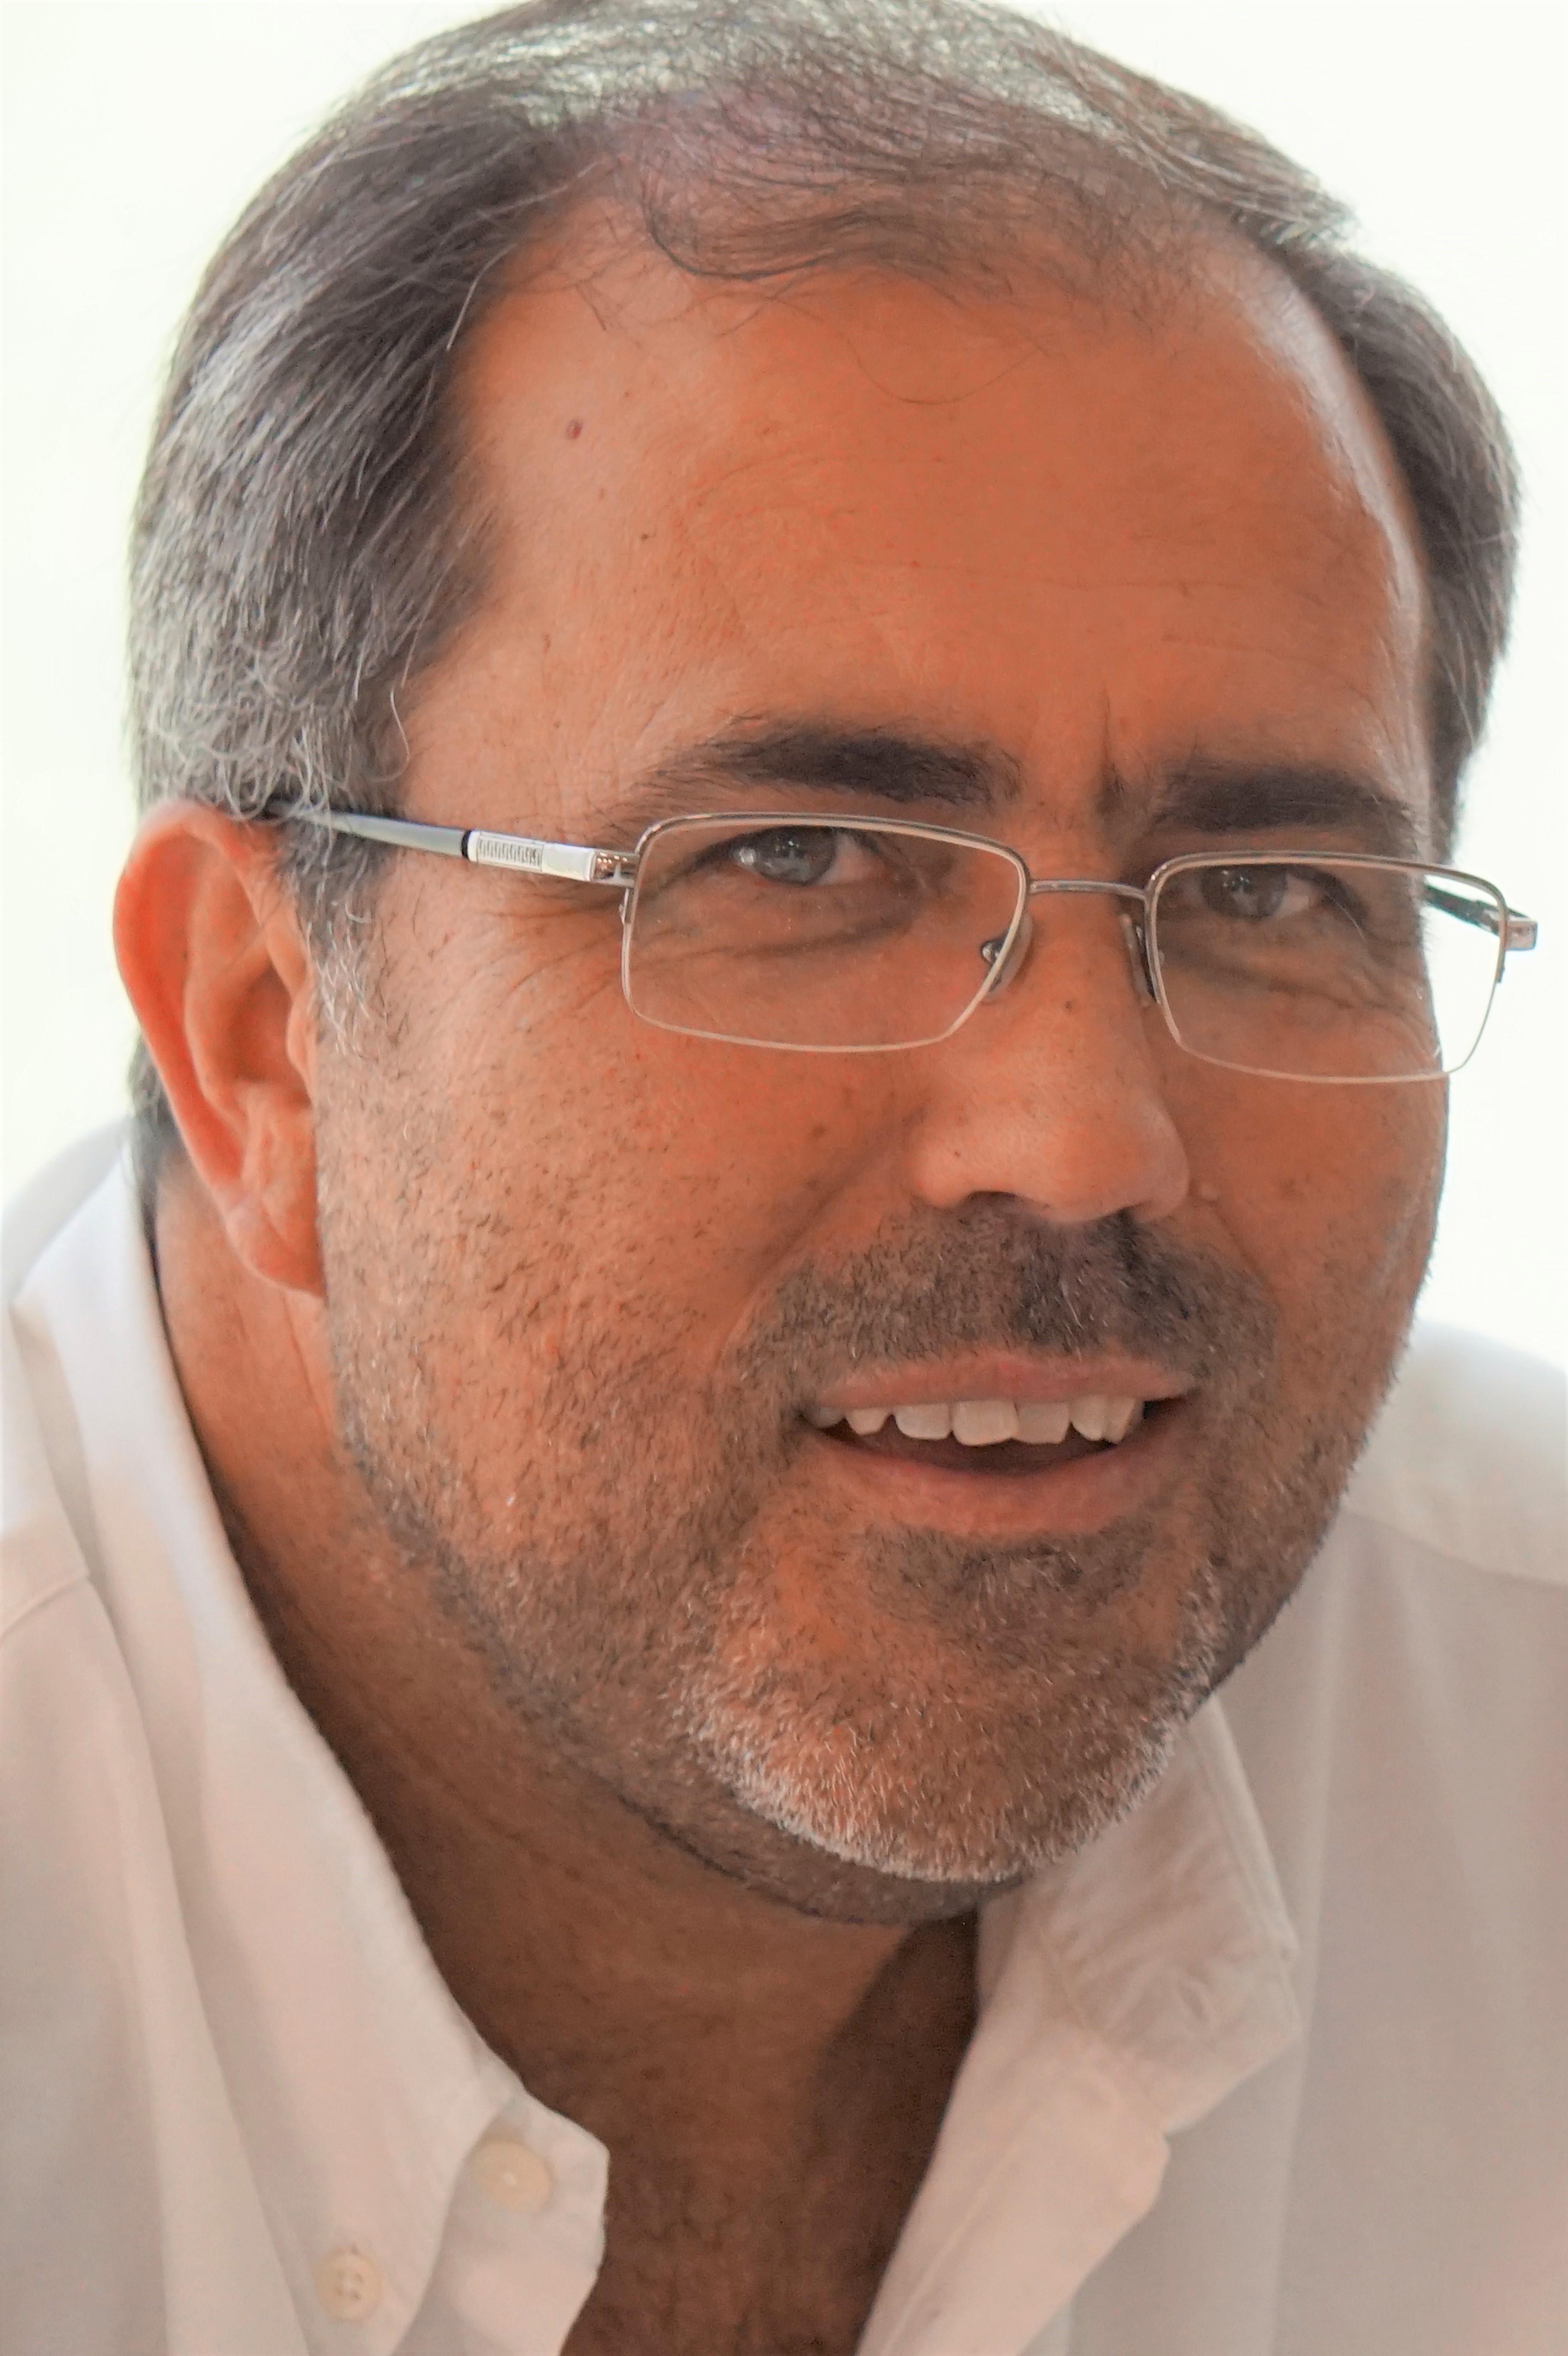 Francisco Vitorino